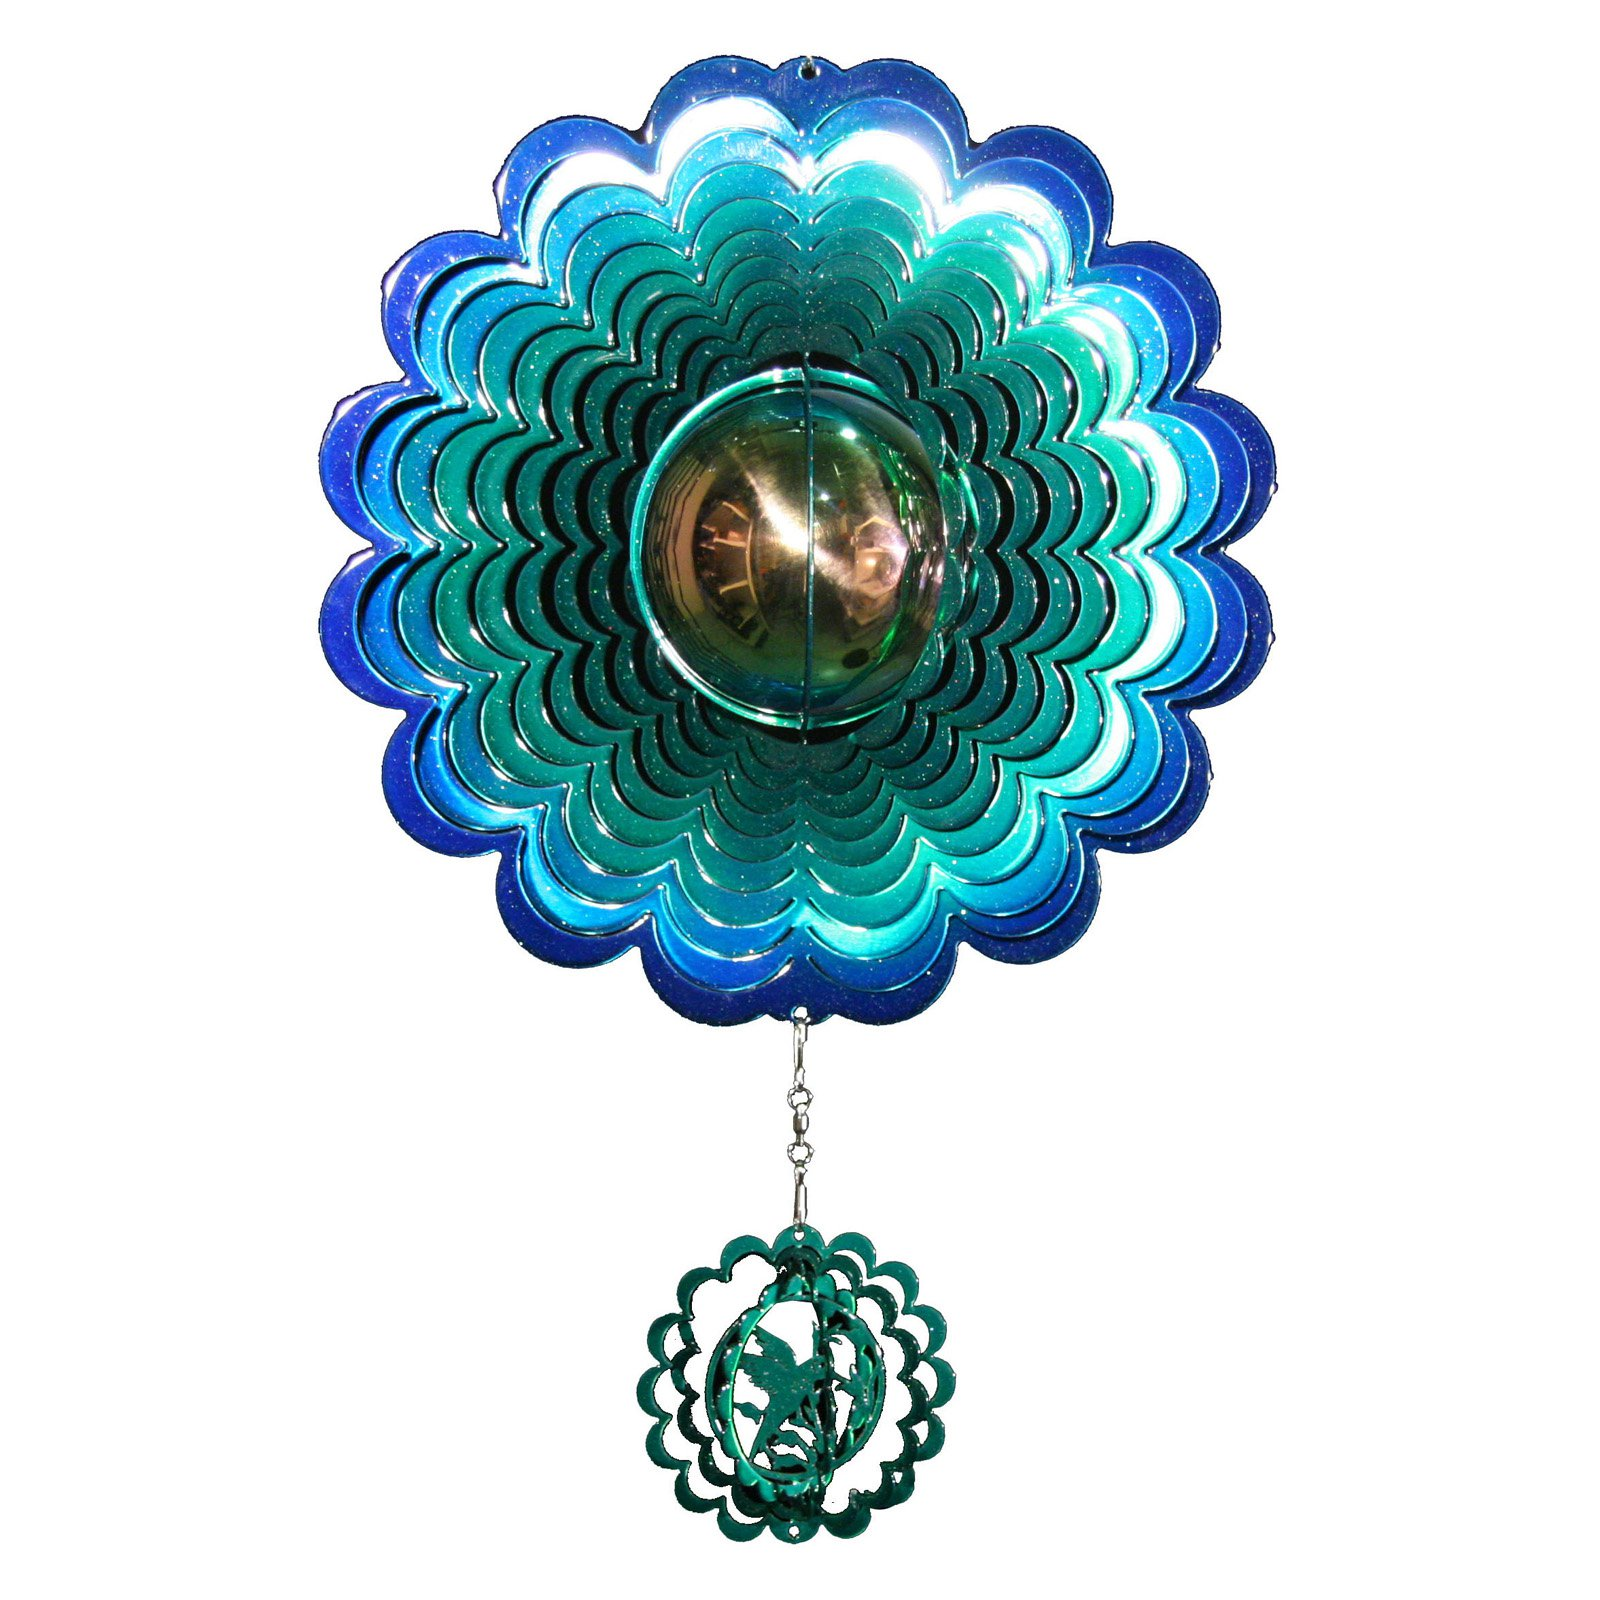 Next Innovations Hummingbird Gazing Ball Spin Wheel by Next Innovations